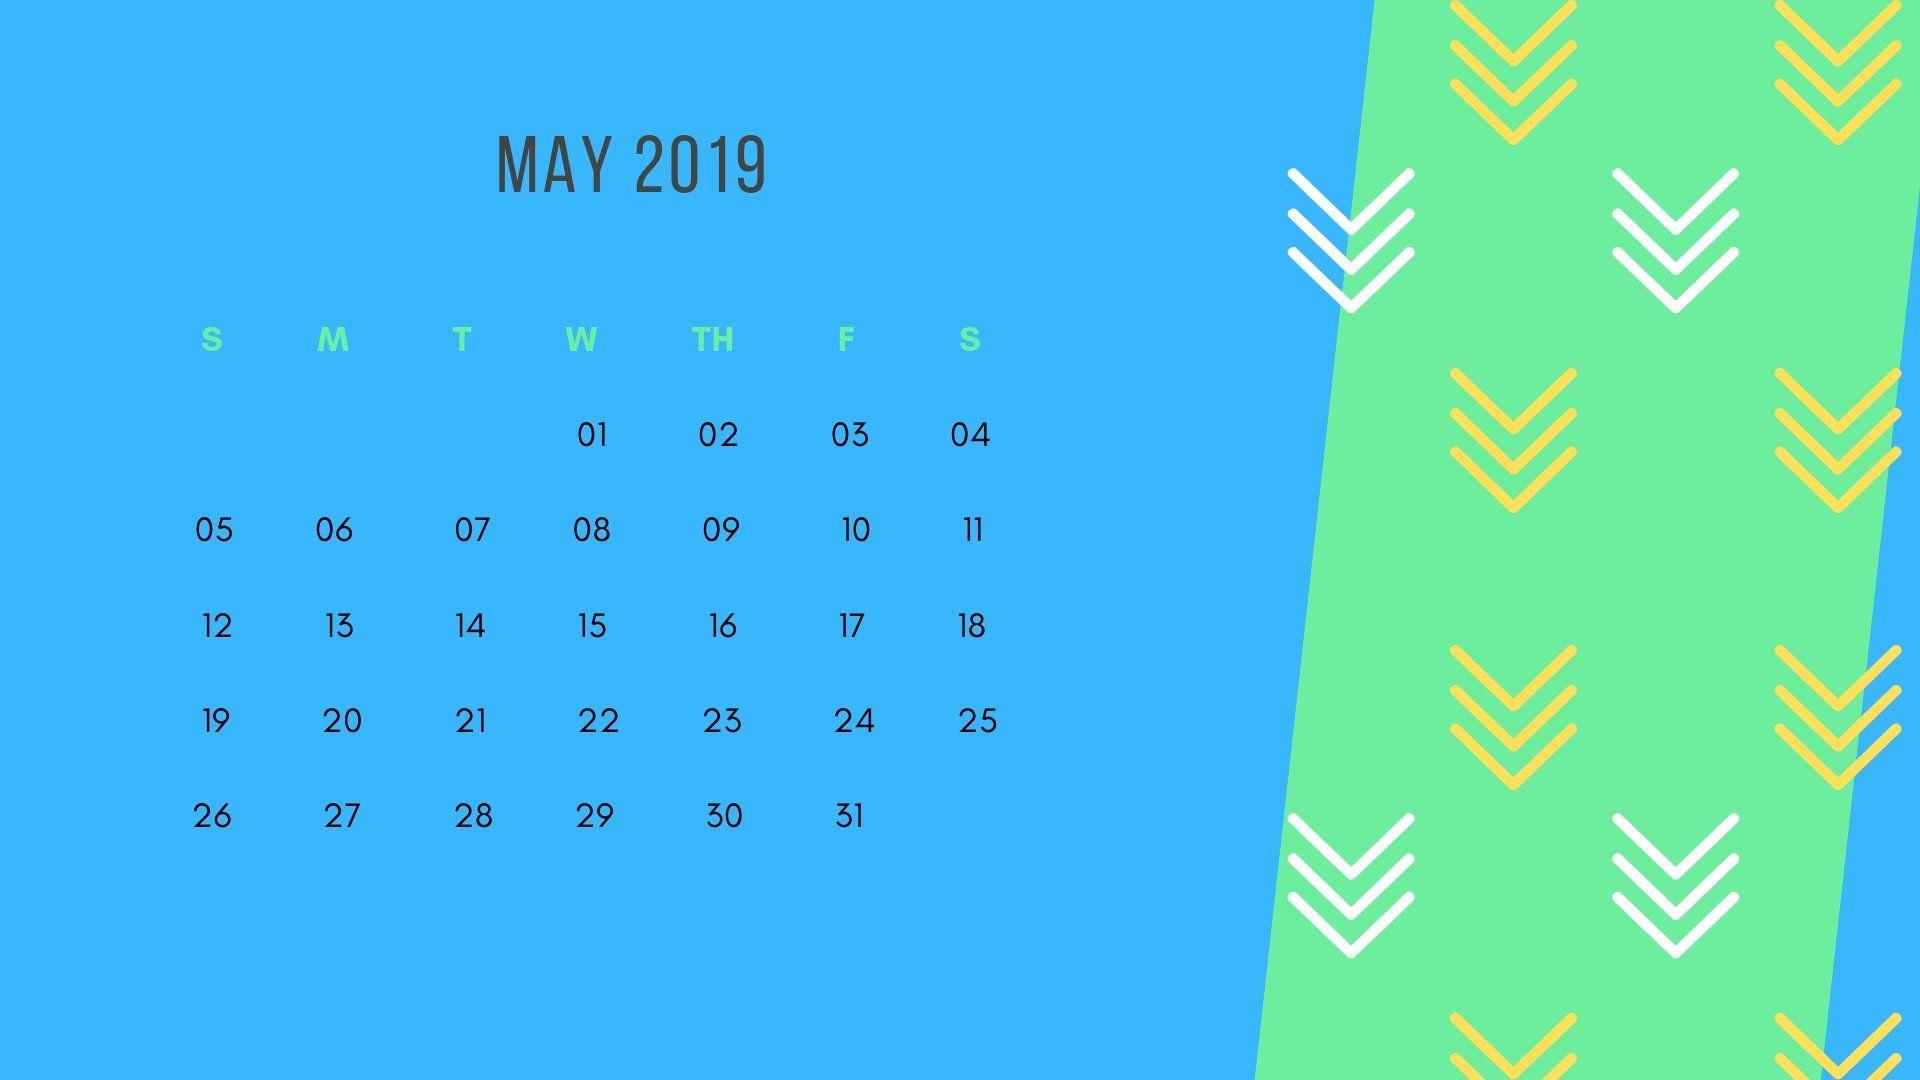 may 2019 calendar wallpaper 2019 Calendars in 2019 2019 1920x1080